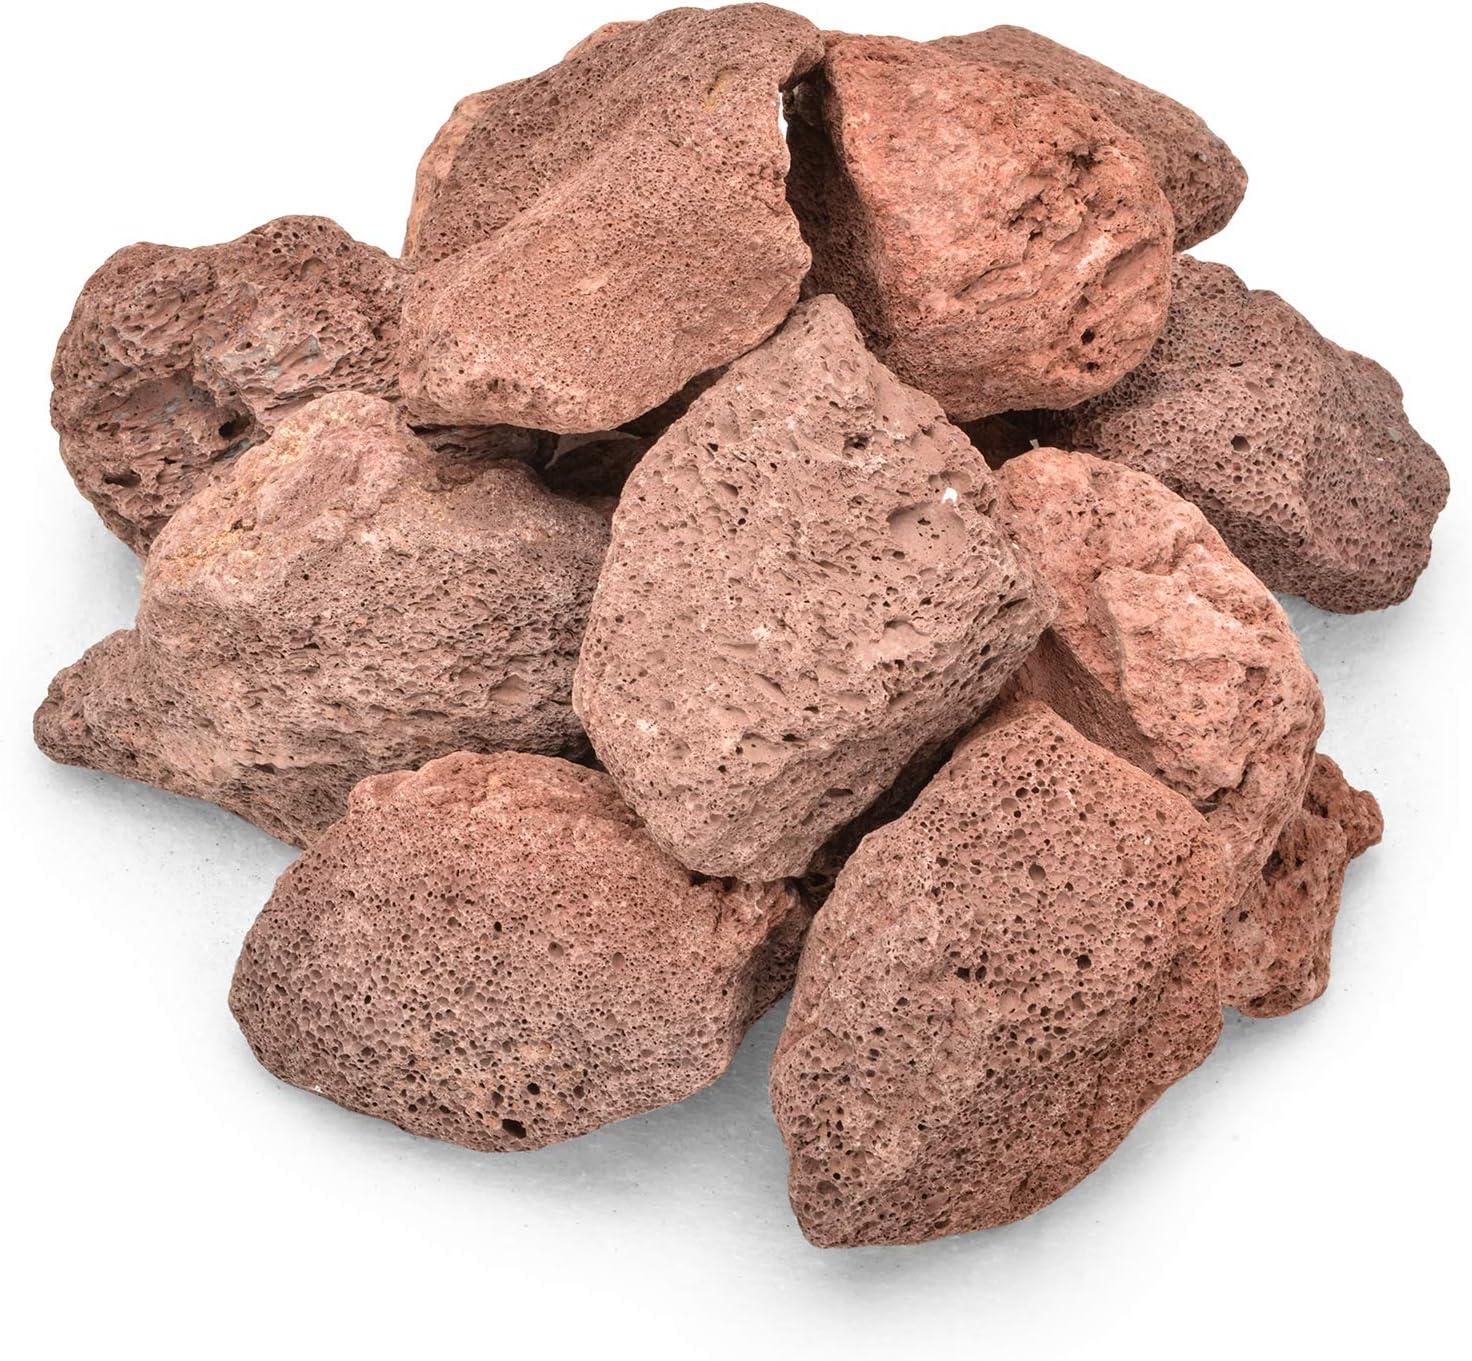 Popular shop [Alternative dealer] is the lowest price challenge Stanbroil Lava Rock Granules Decorative Bo Fire Landscaping for